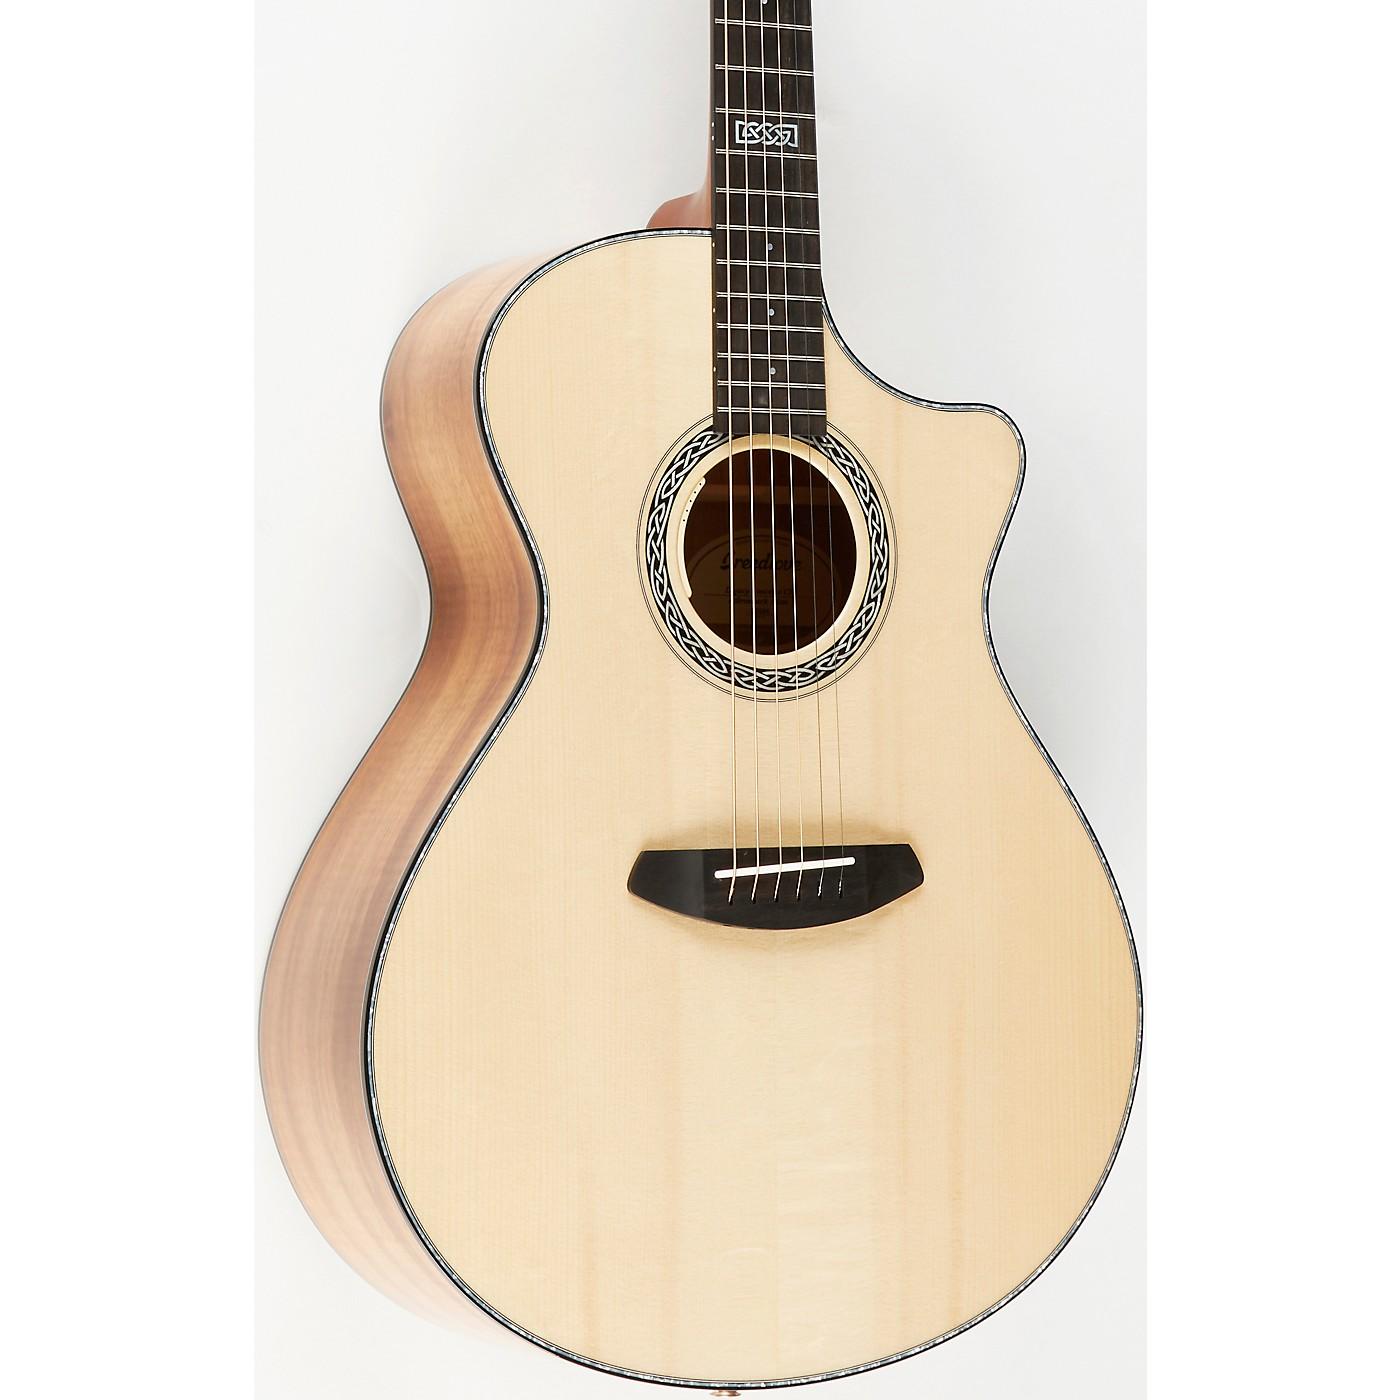 Breedlove Legacy Concerto CE Adirondack-Koa Acoustic-Electric Guitar thumbnail